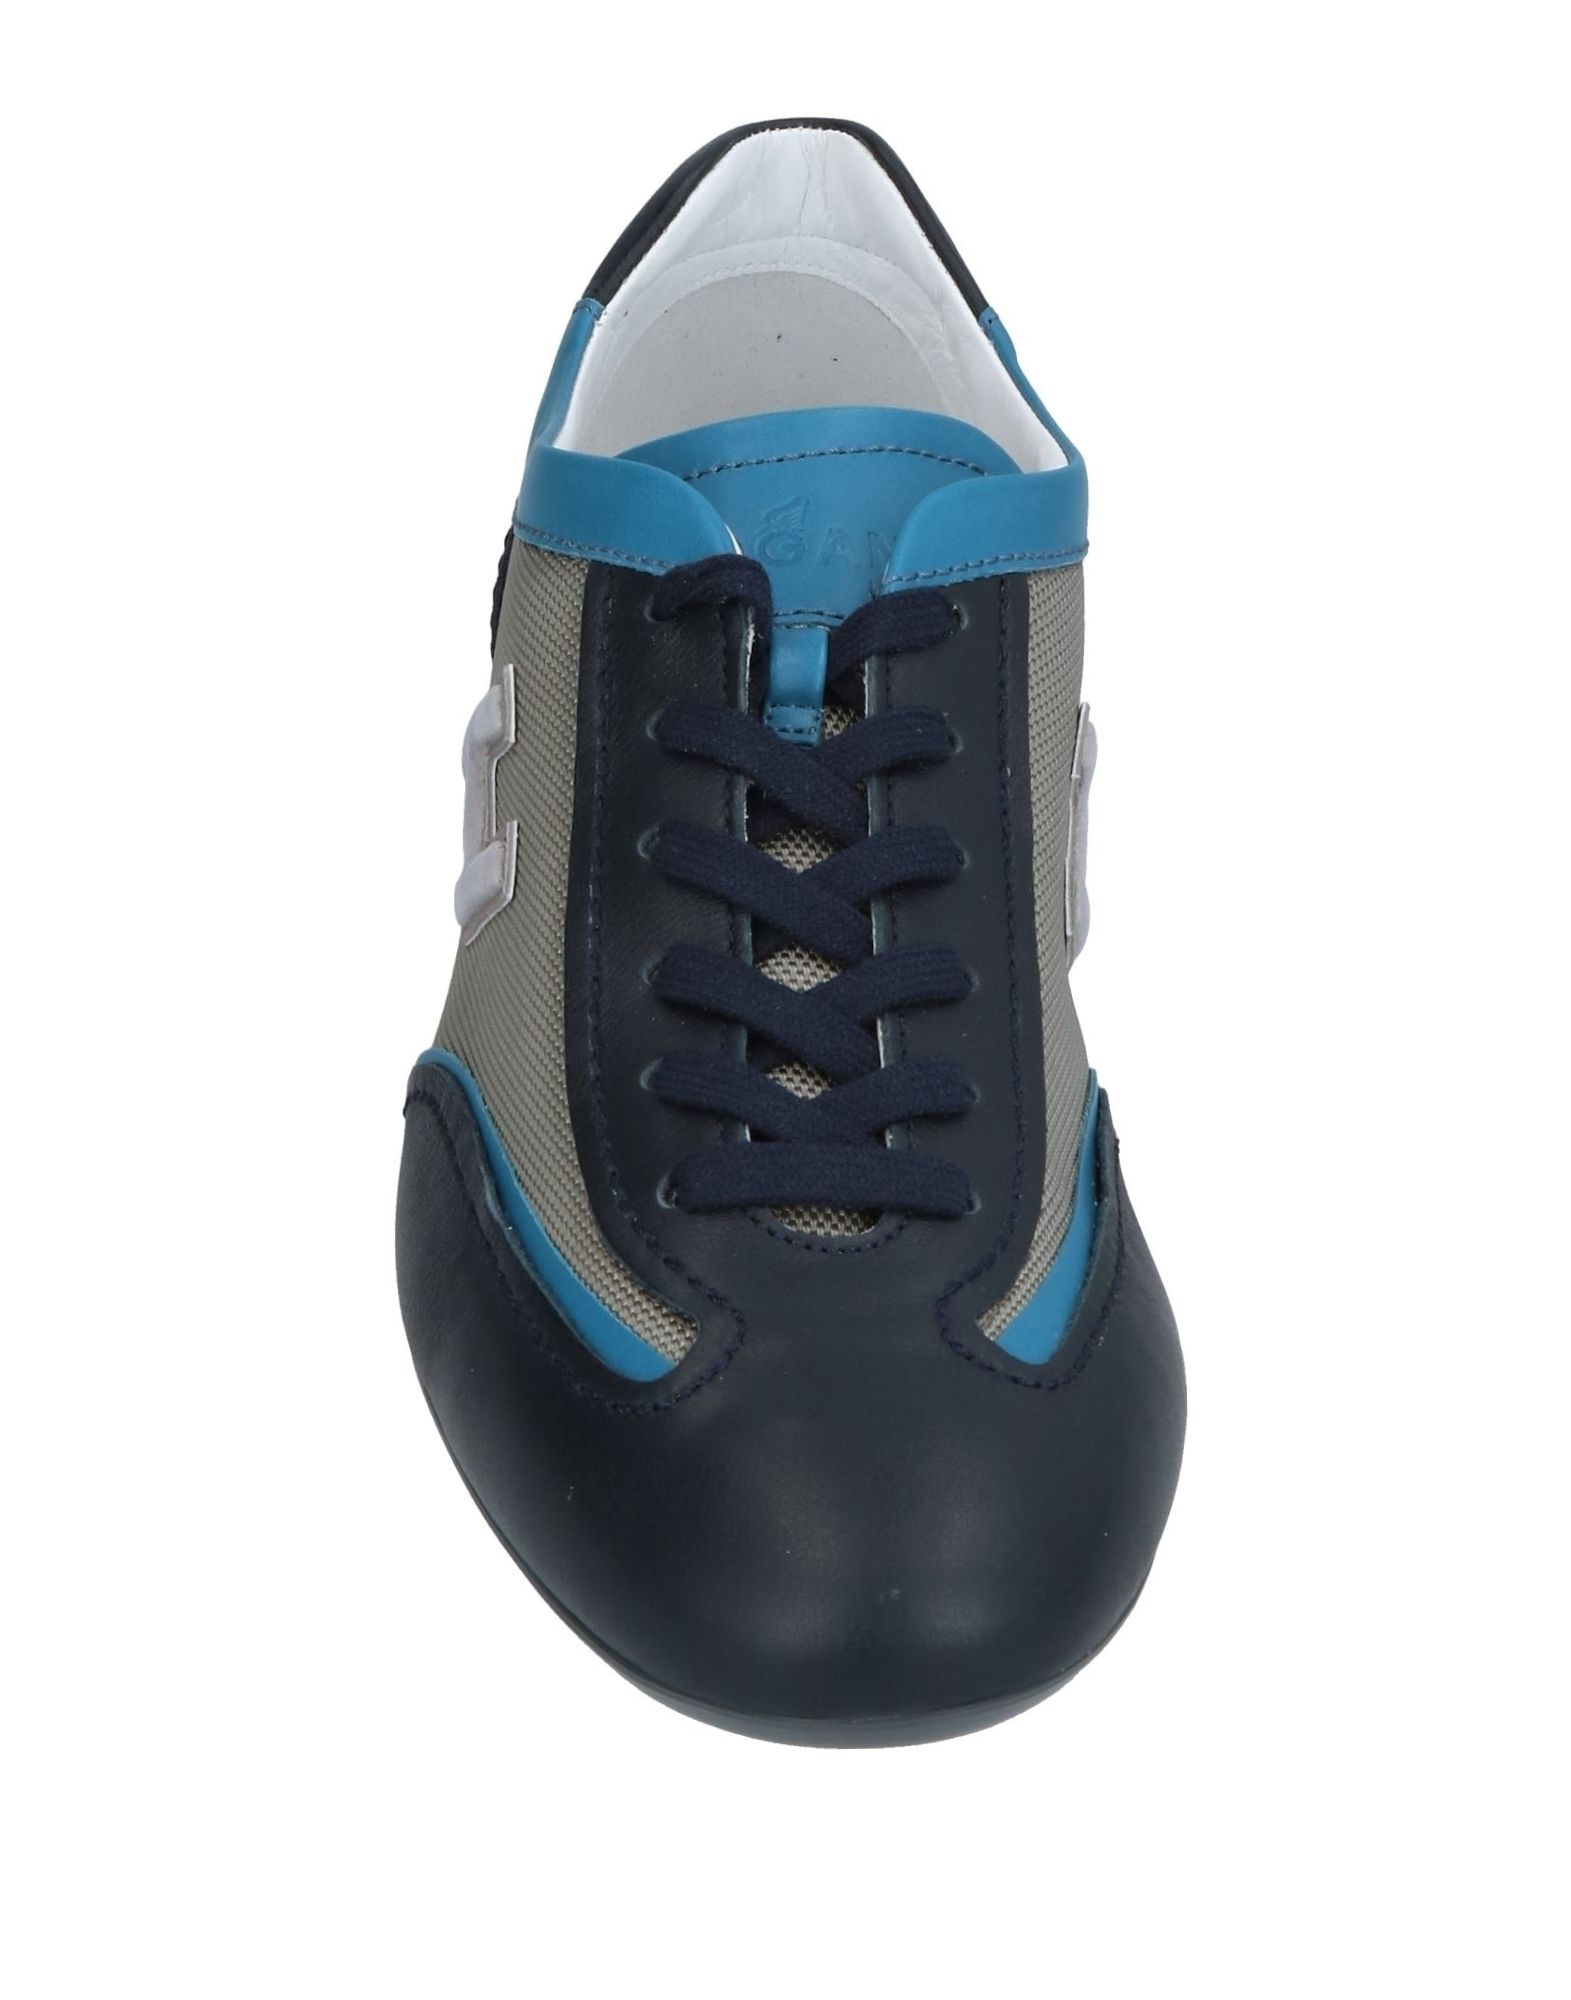 11412427MW Hogan Sneakers Herren  11412427MW  0d5576